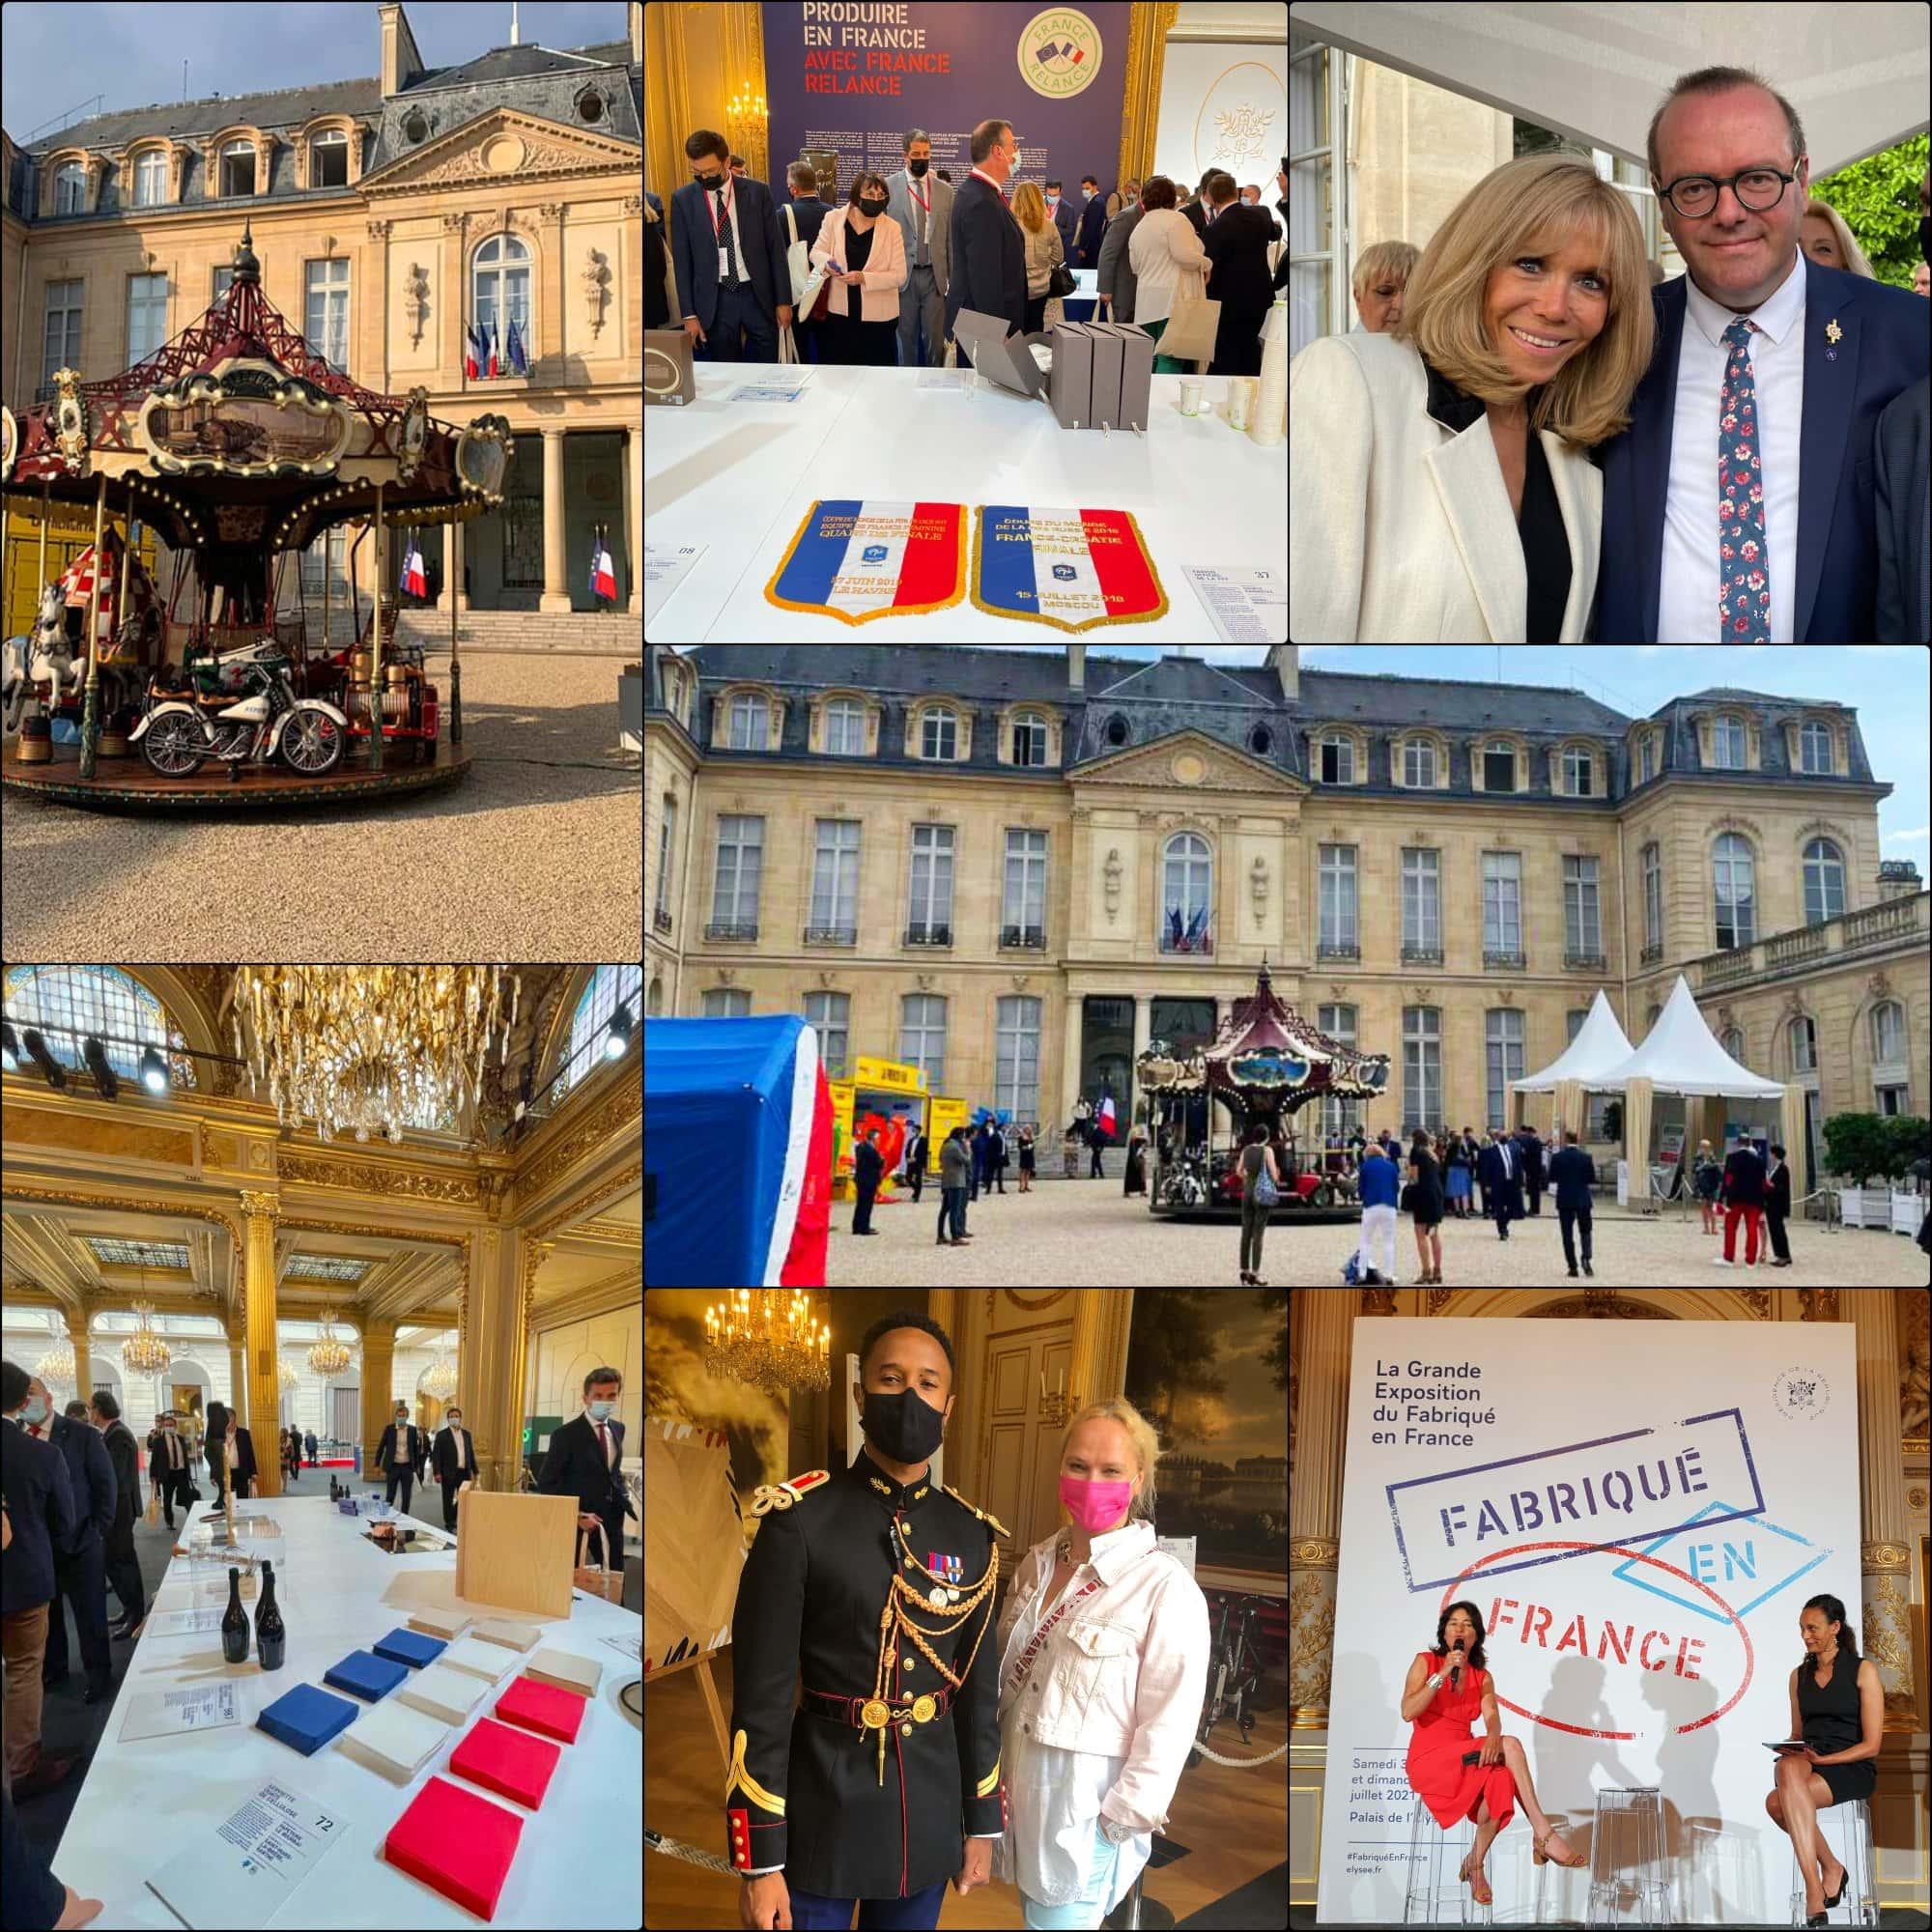 Fabriqué en France 2021 Élysée expo par RUNWAY RIVISTA. Brigitte Macron, Eleonora de Gray